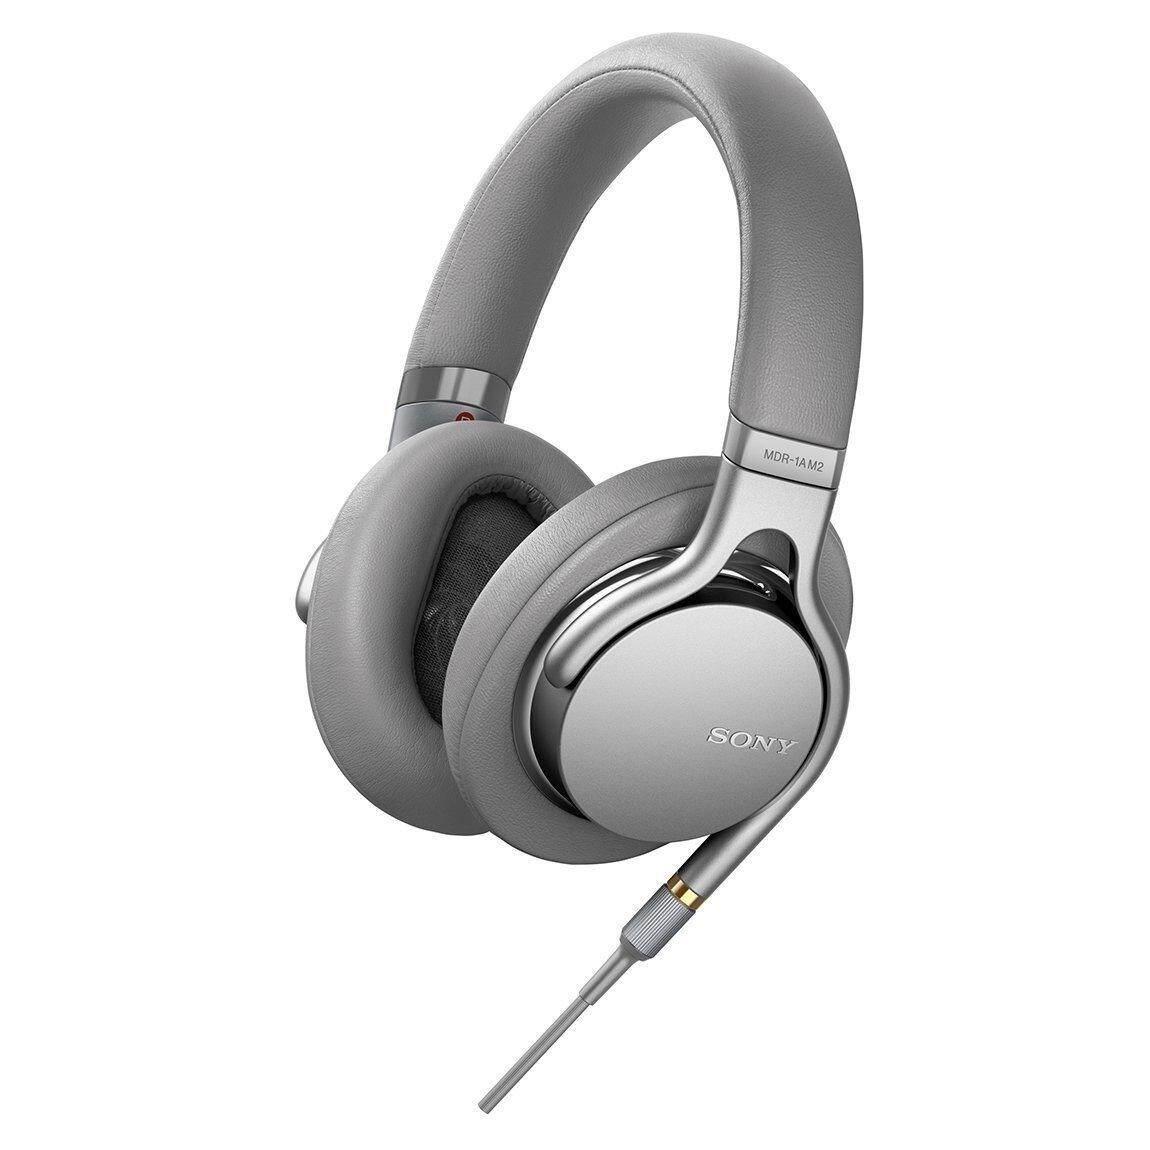 Sony High-Resolution Audio Headphone รุ่น MDR 1AM2 - Silver